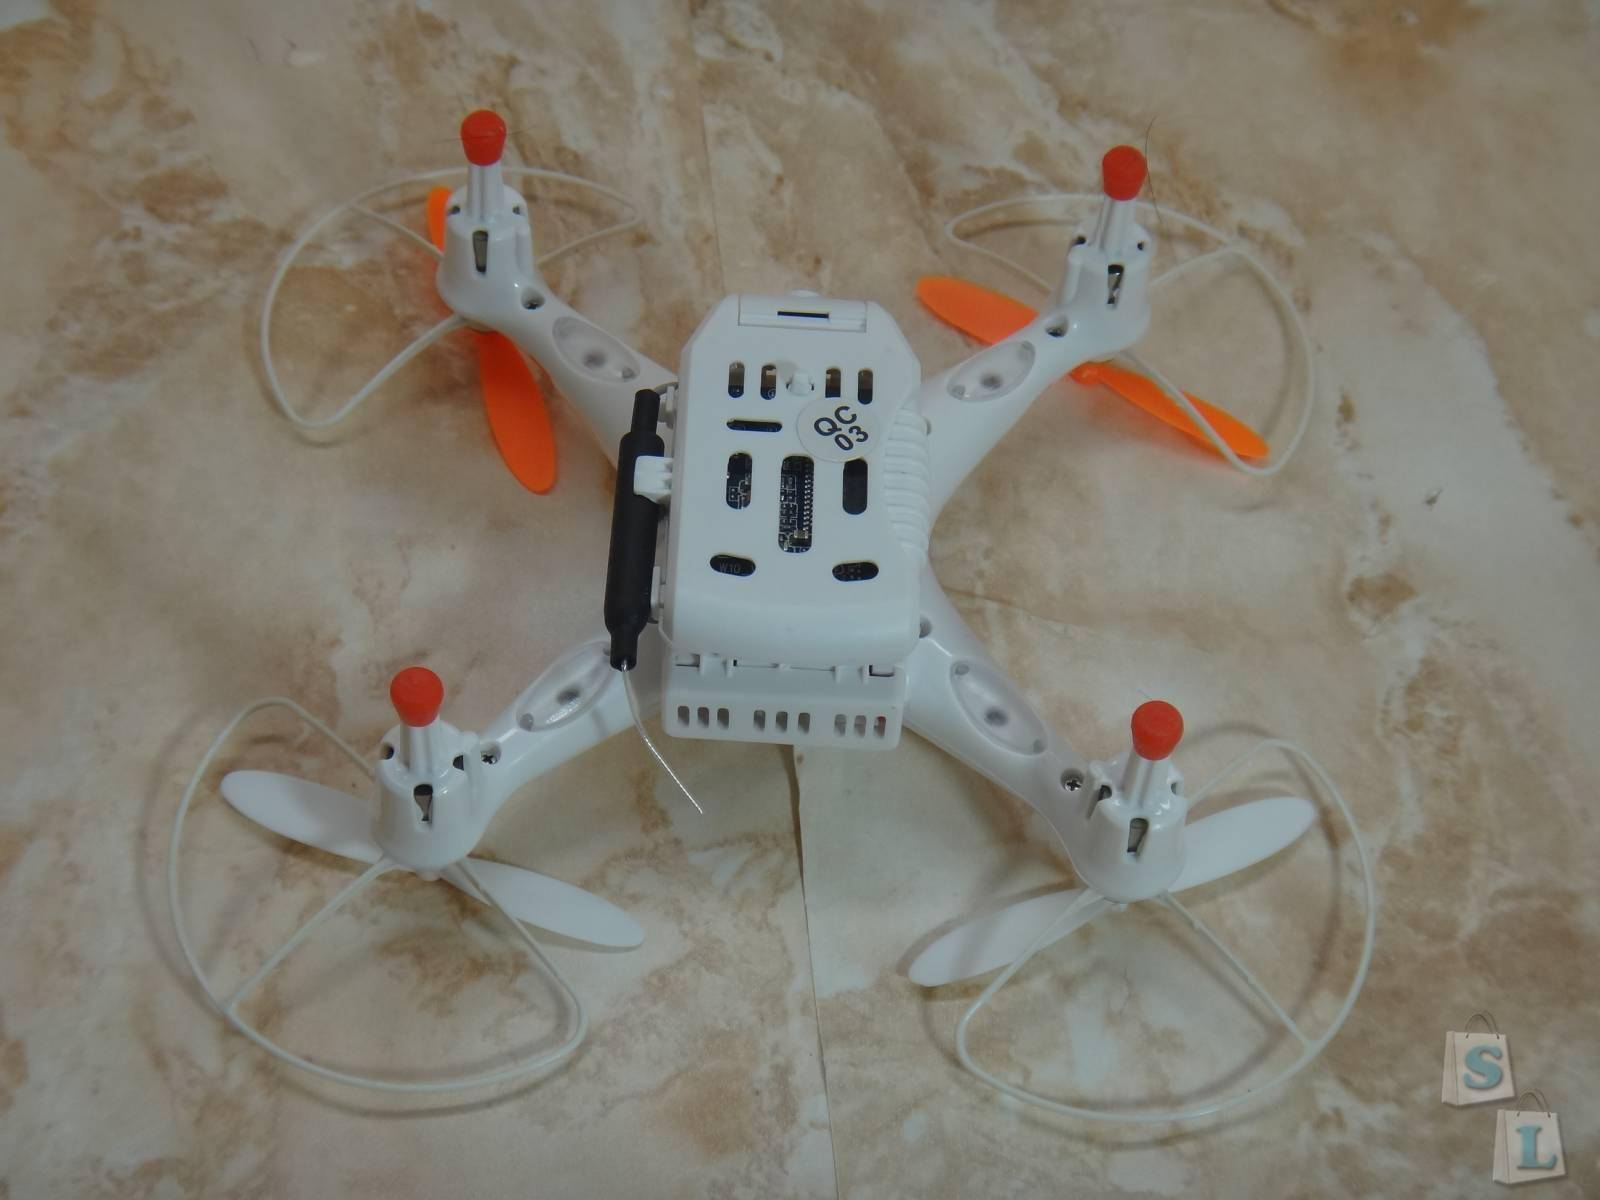 Banggood: Квадрокоптер Cheerson CX-30W с WiFi First Person View или телефон в роли пульта